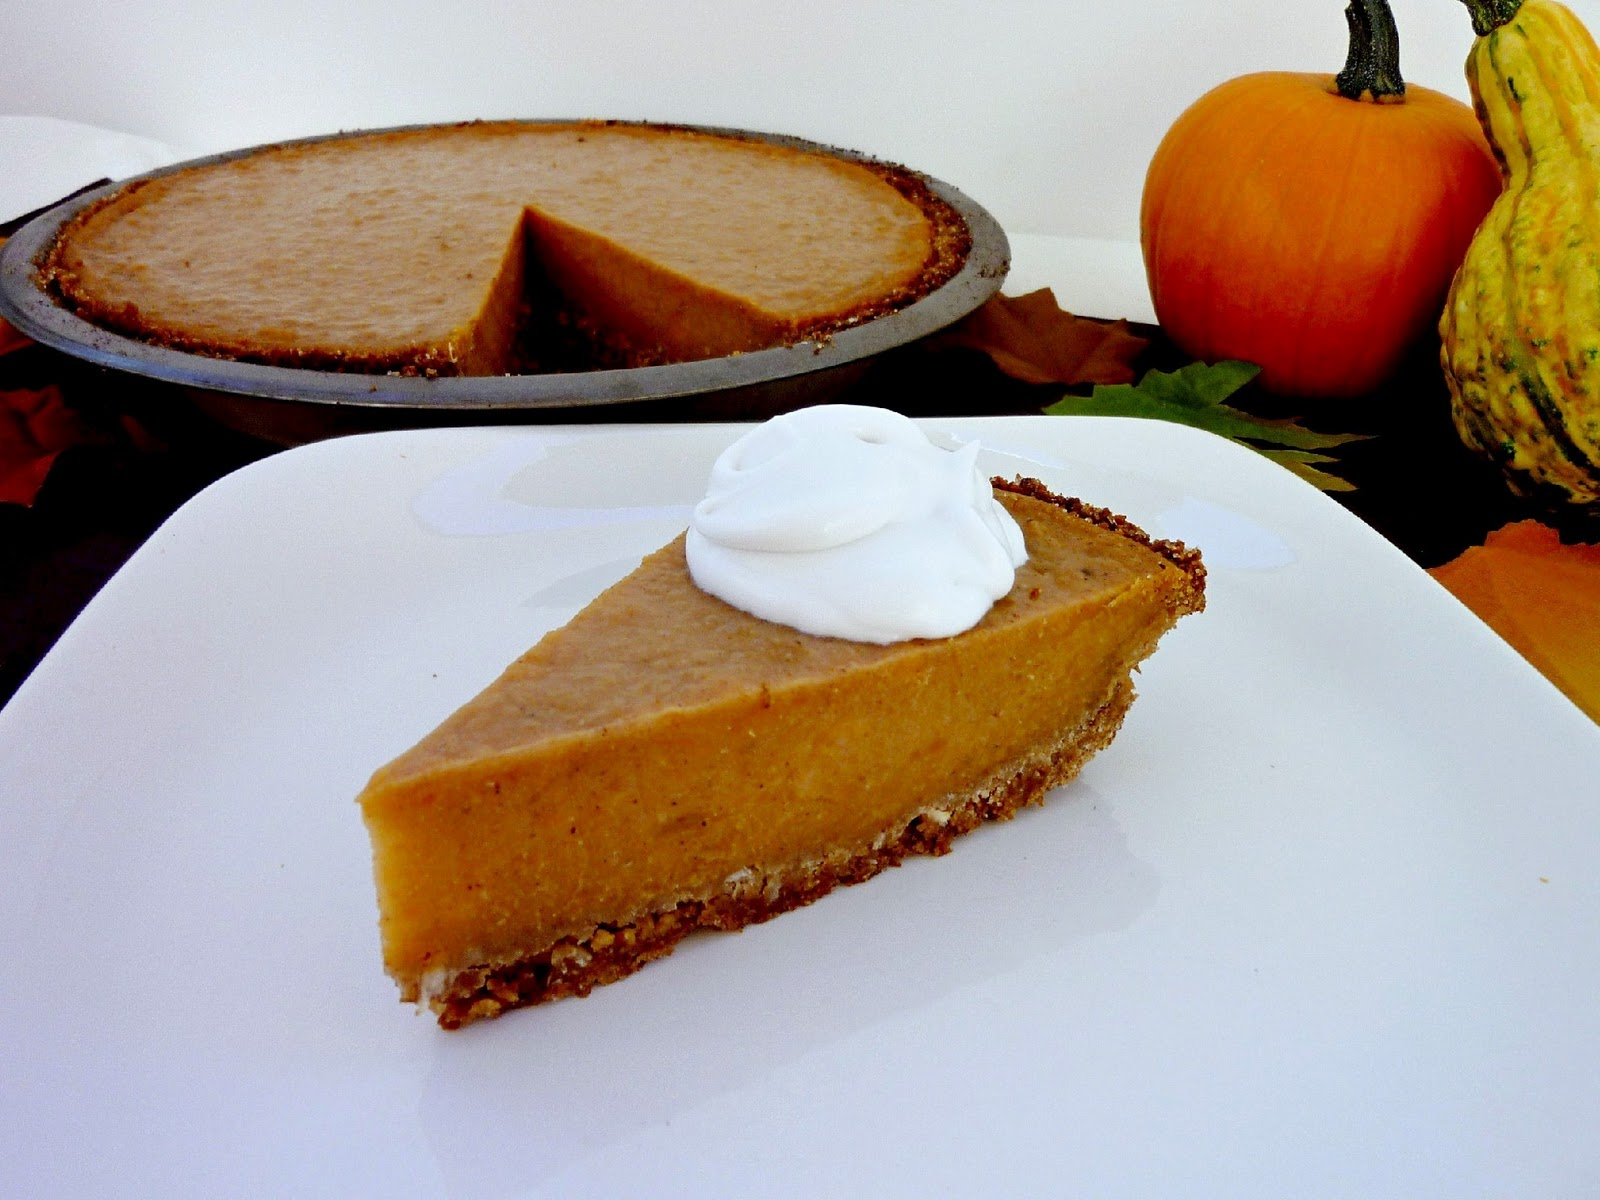 ... & Spice: Thanksgiving Week - Day 7: Vegan Coconut Sweet Potato Pie